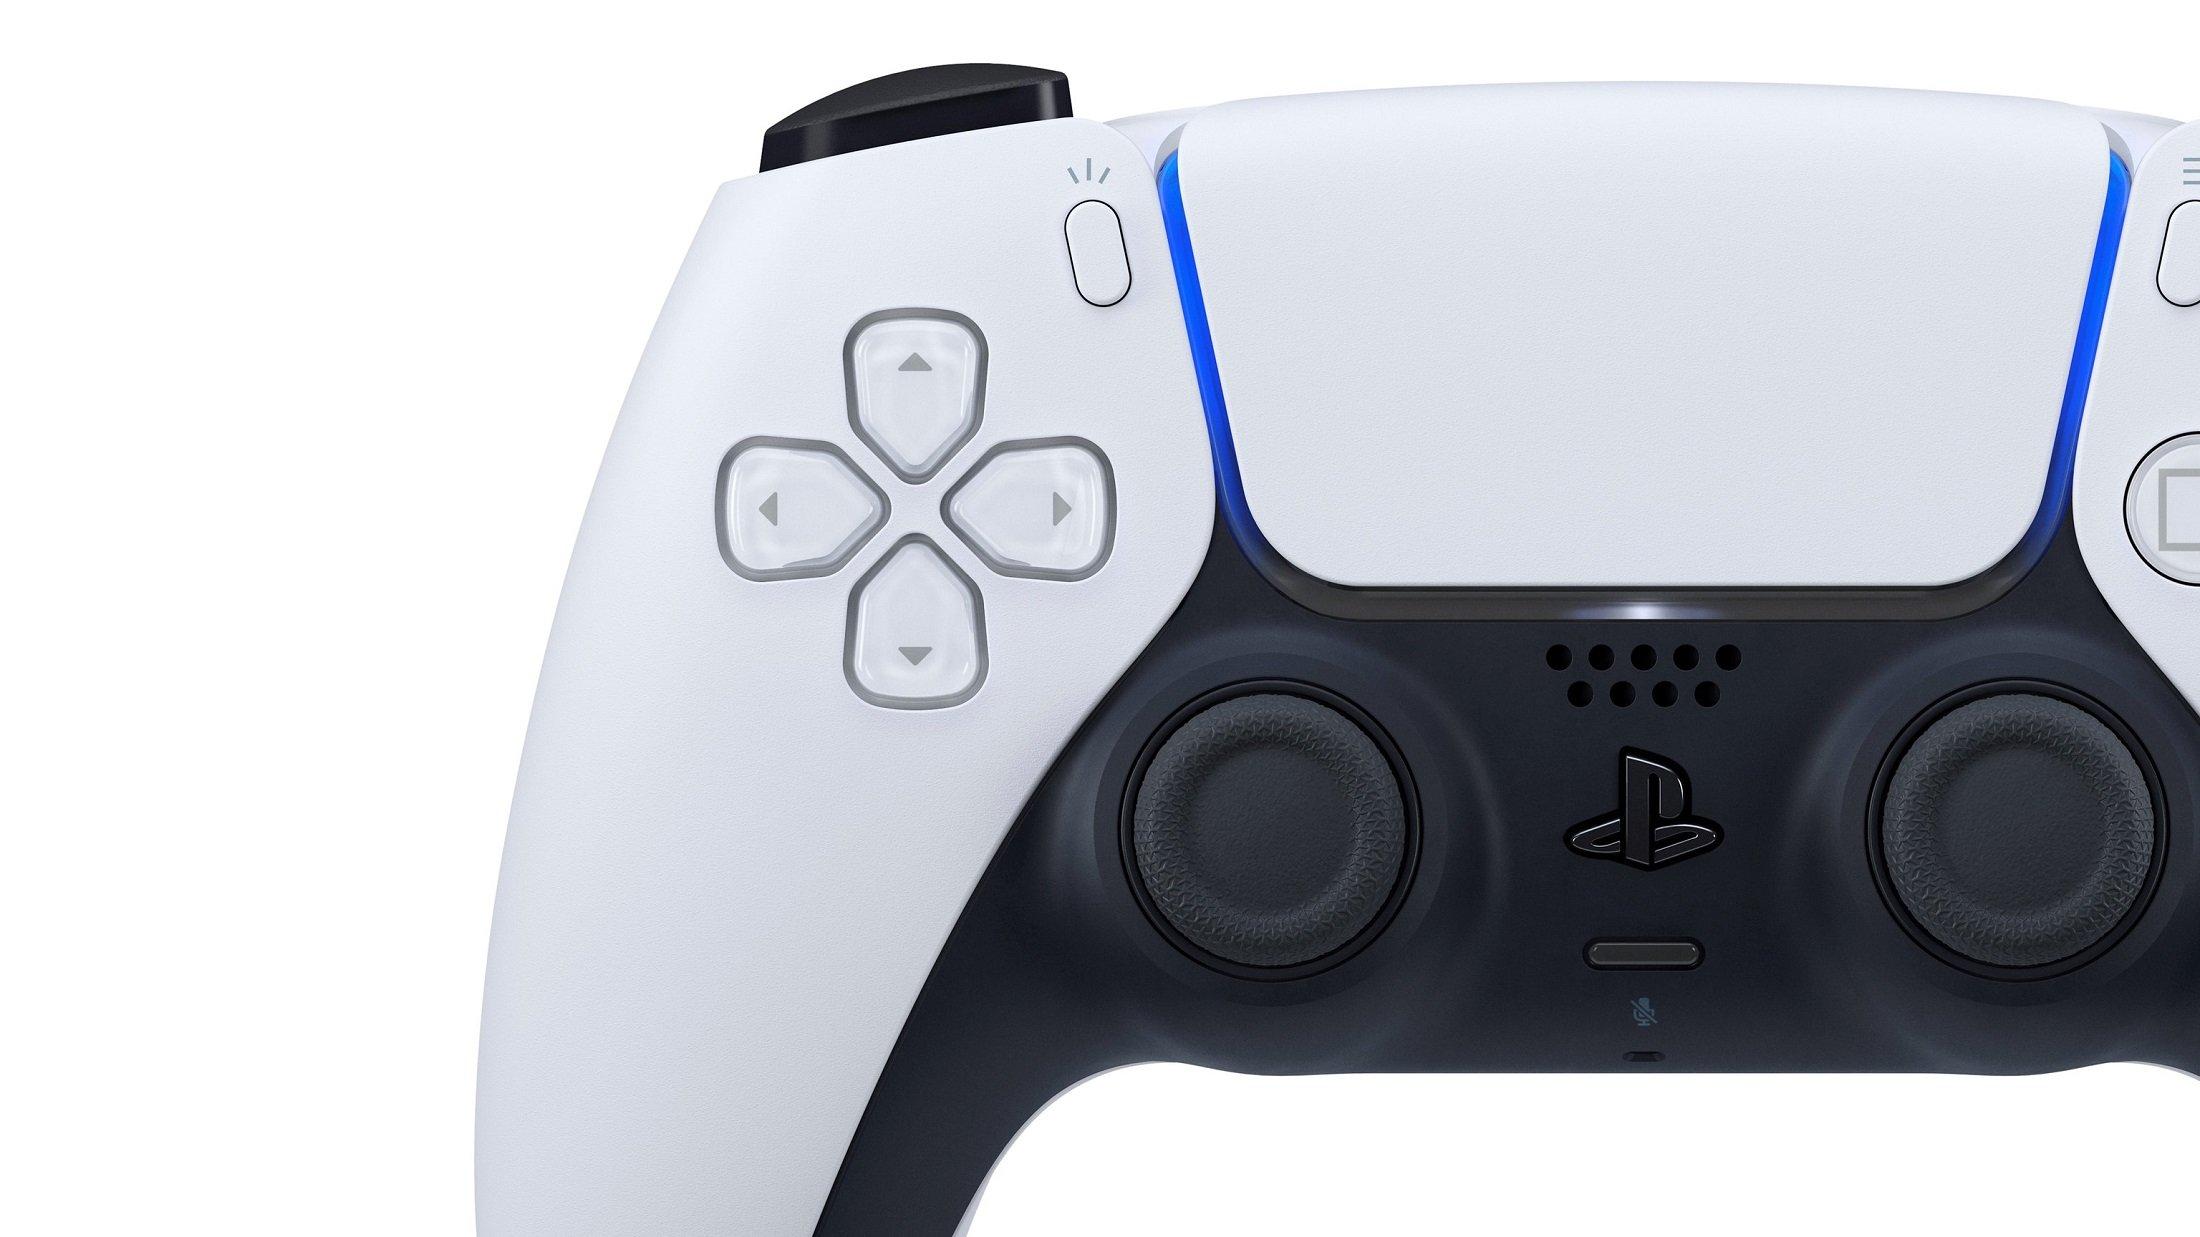 PS5 reveal may happen next week